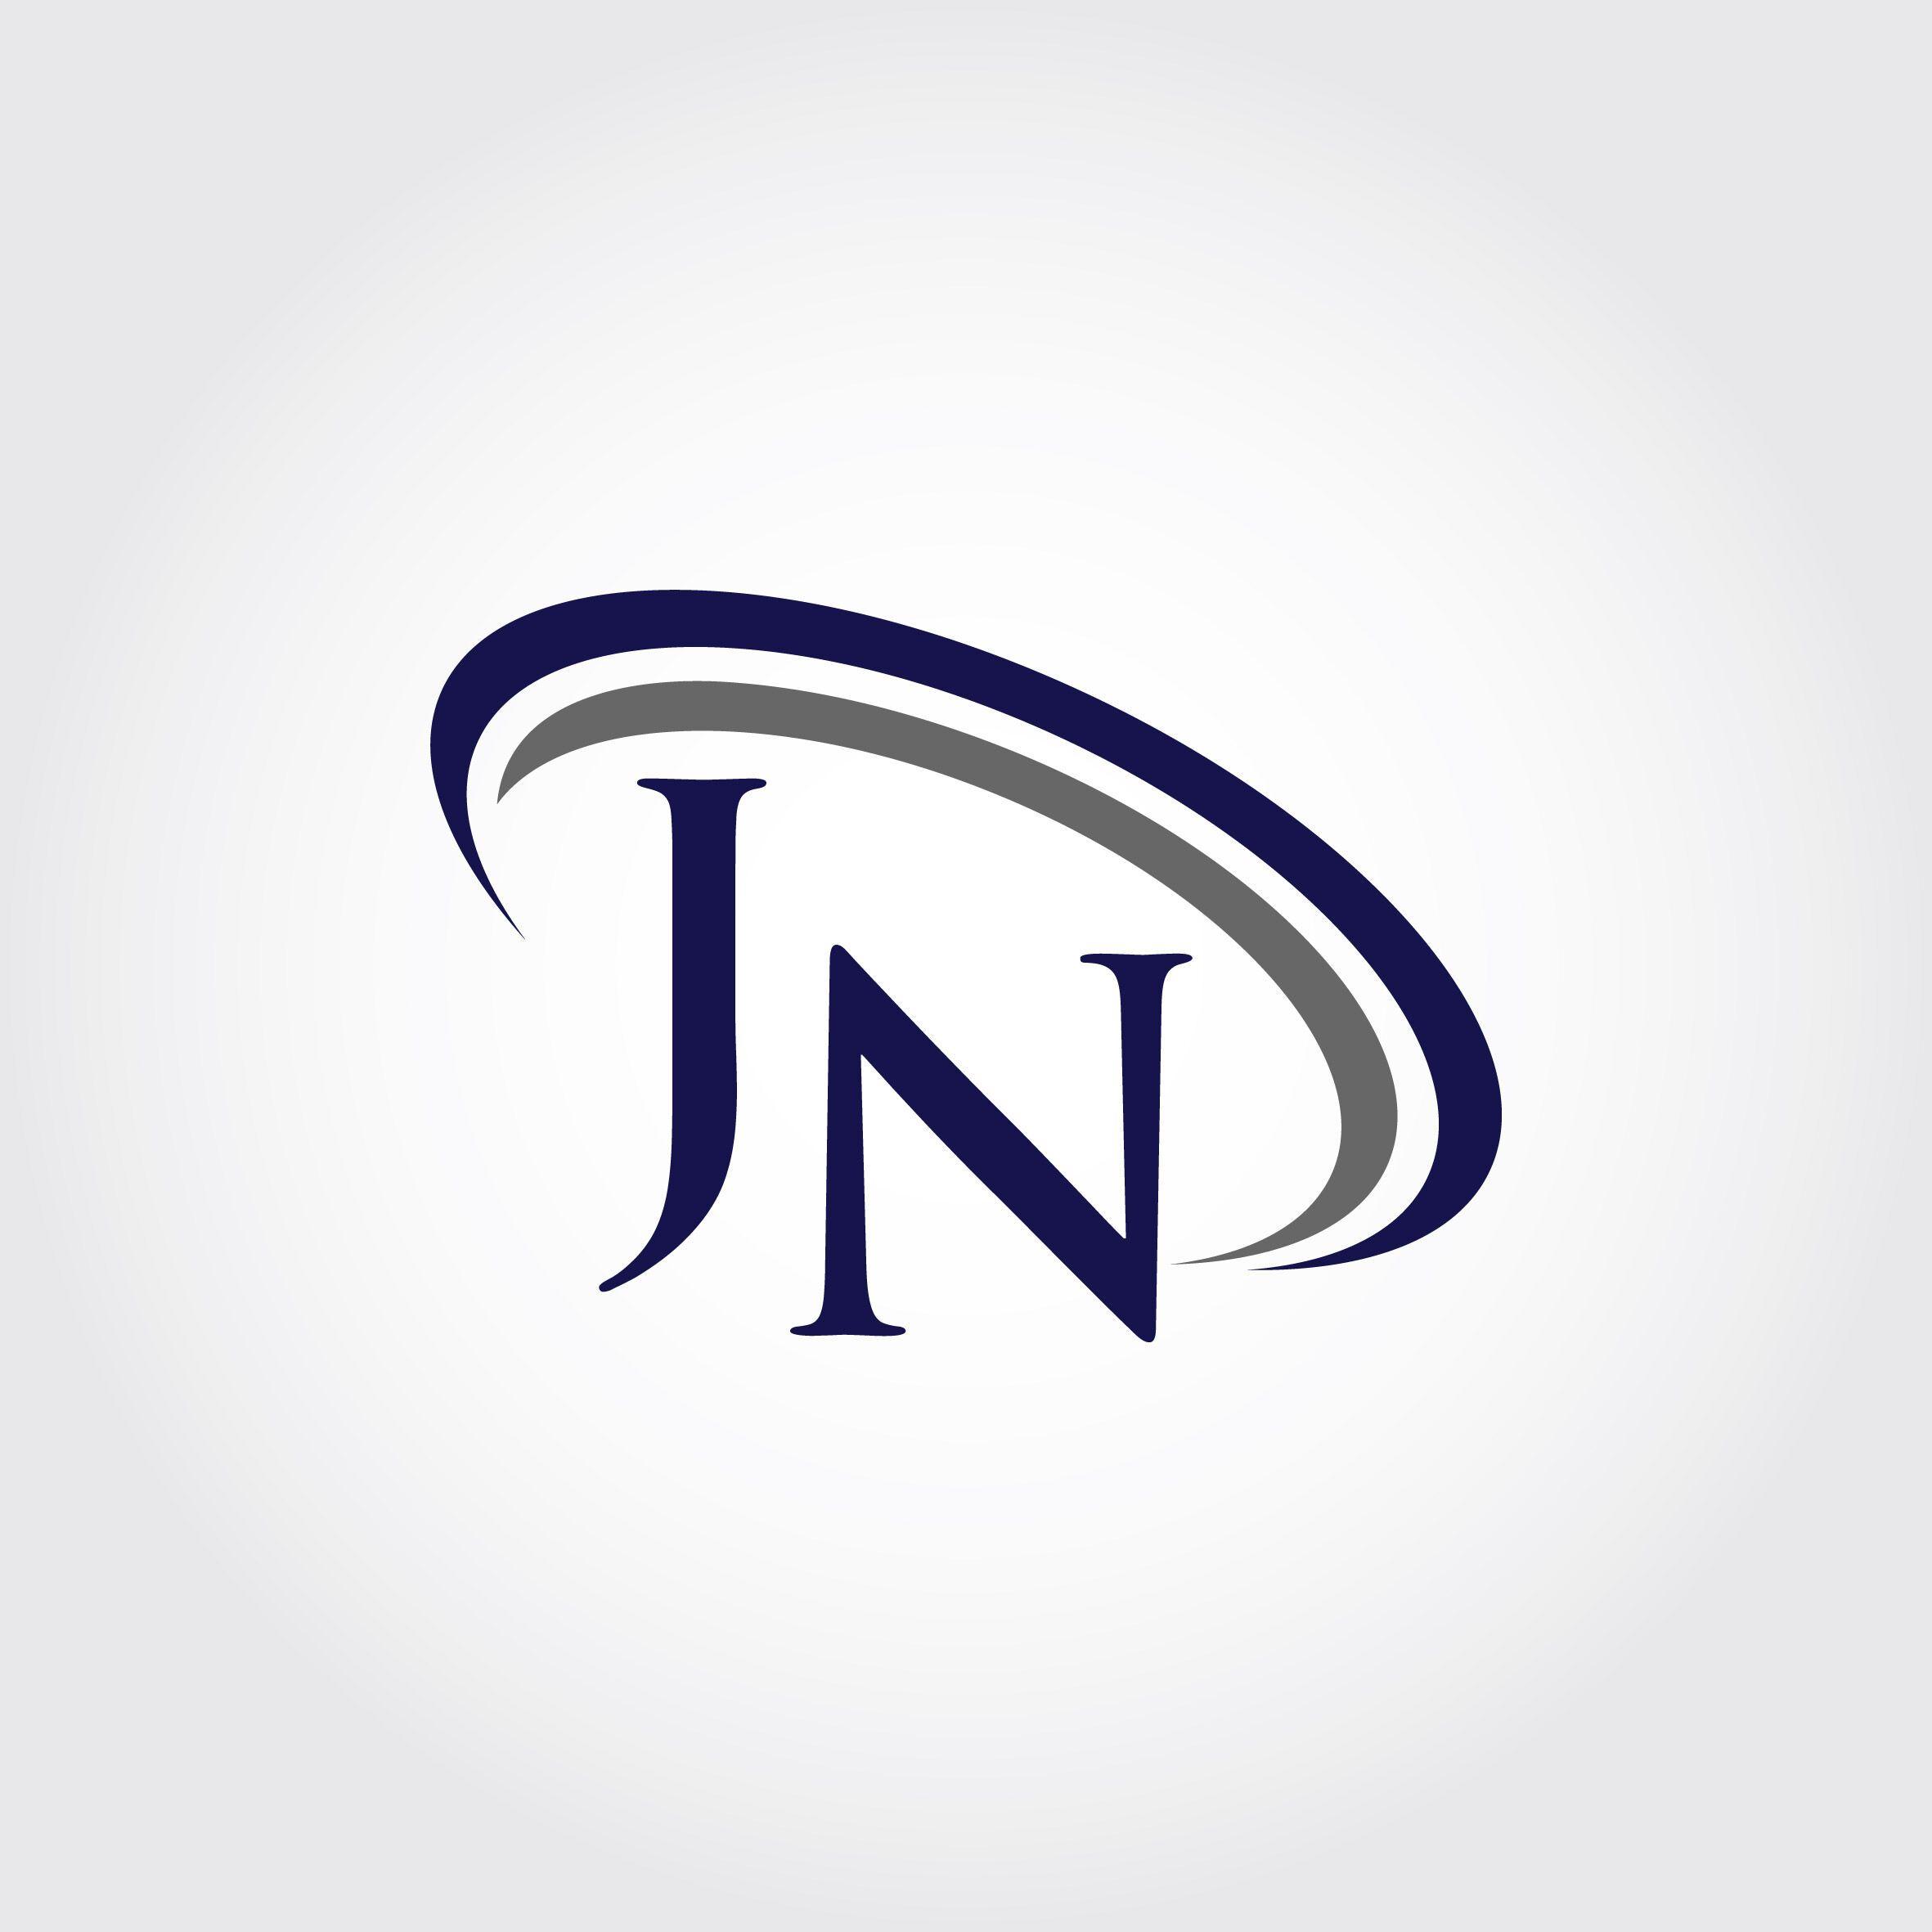 Monogram Jn Logo Design By Vectorseller Thehungryjpeg Com Logo Design N Logo Design Logos